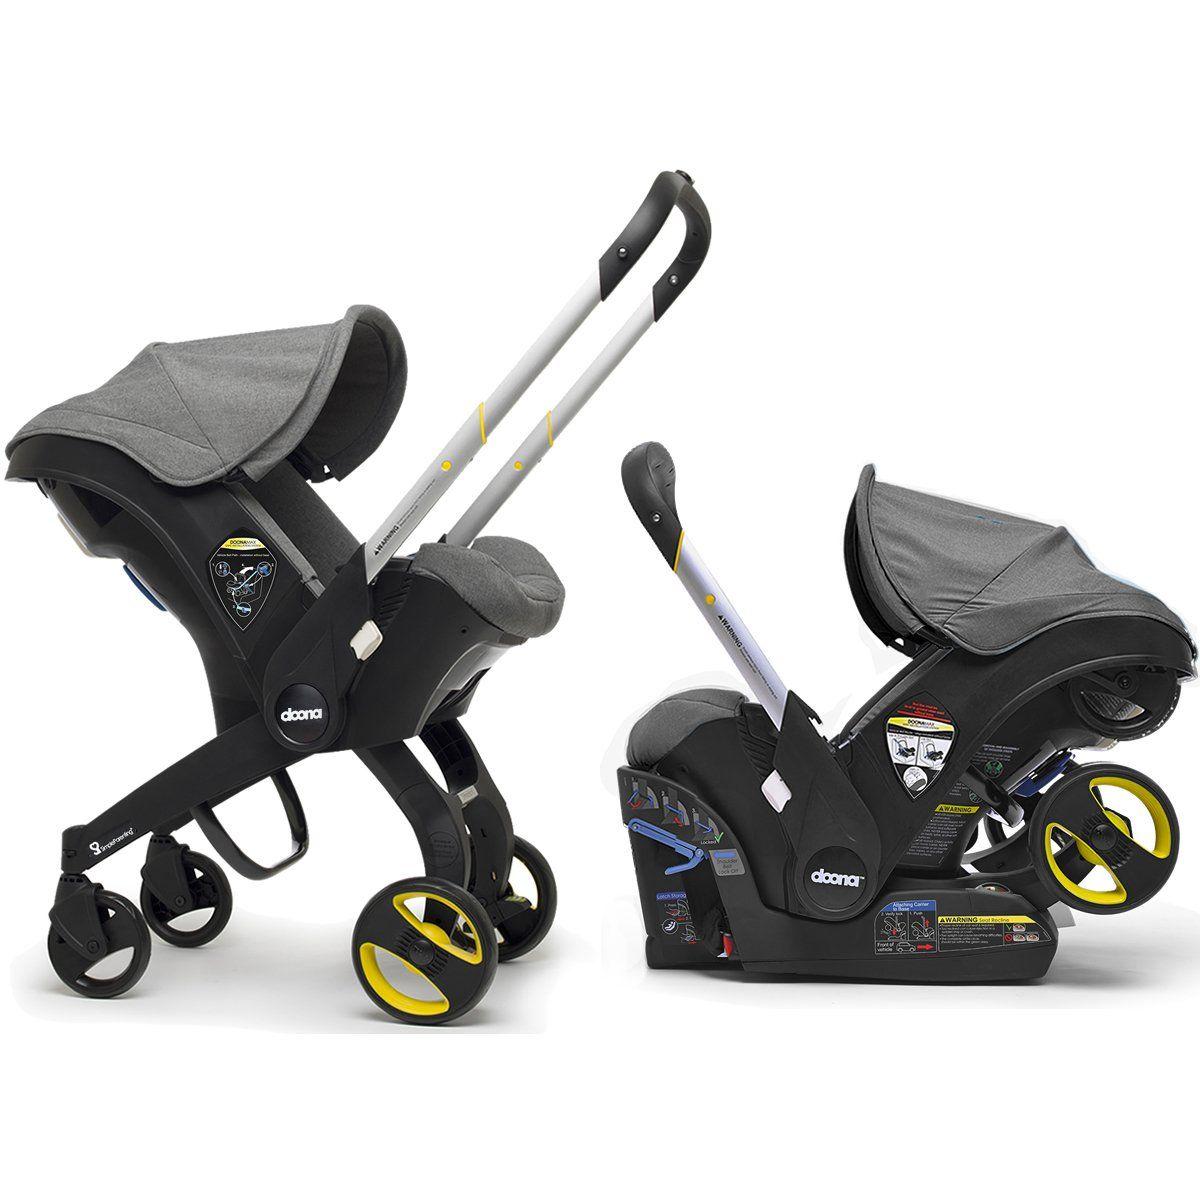 Doona Car Seat Stroller + Base 2019/2020 Rodzicielstwo i